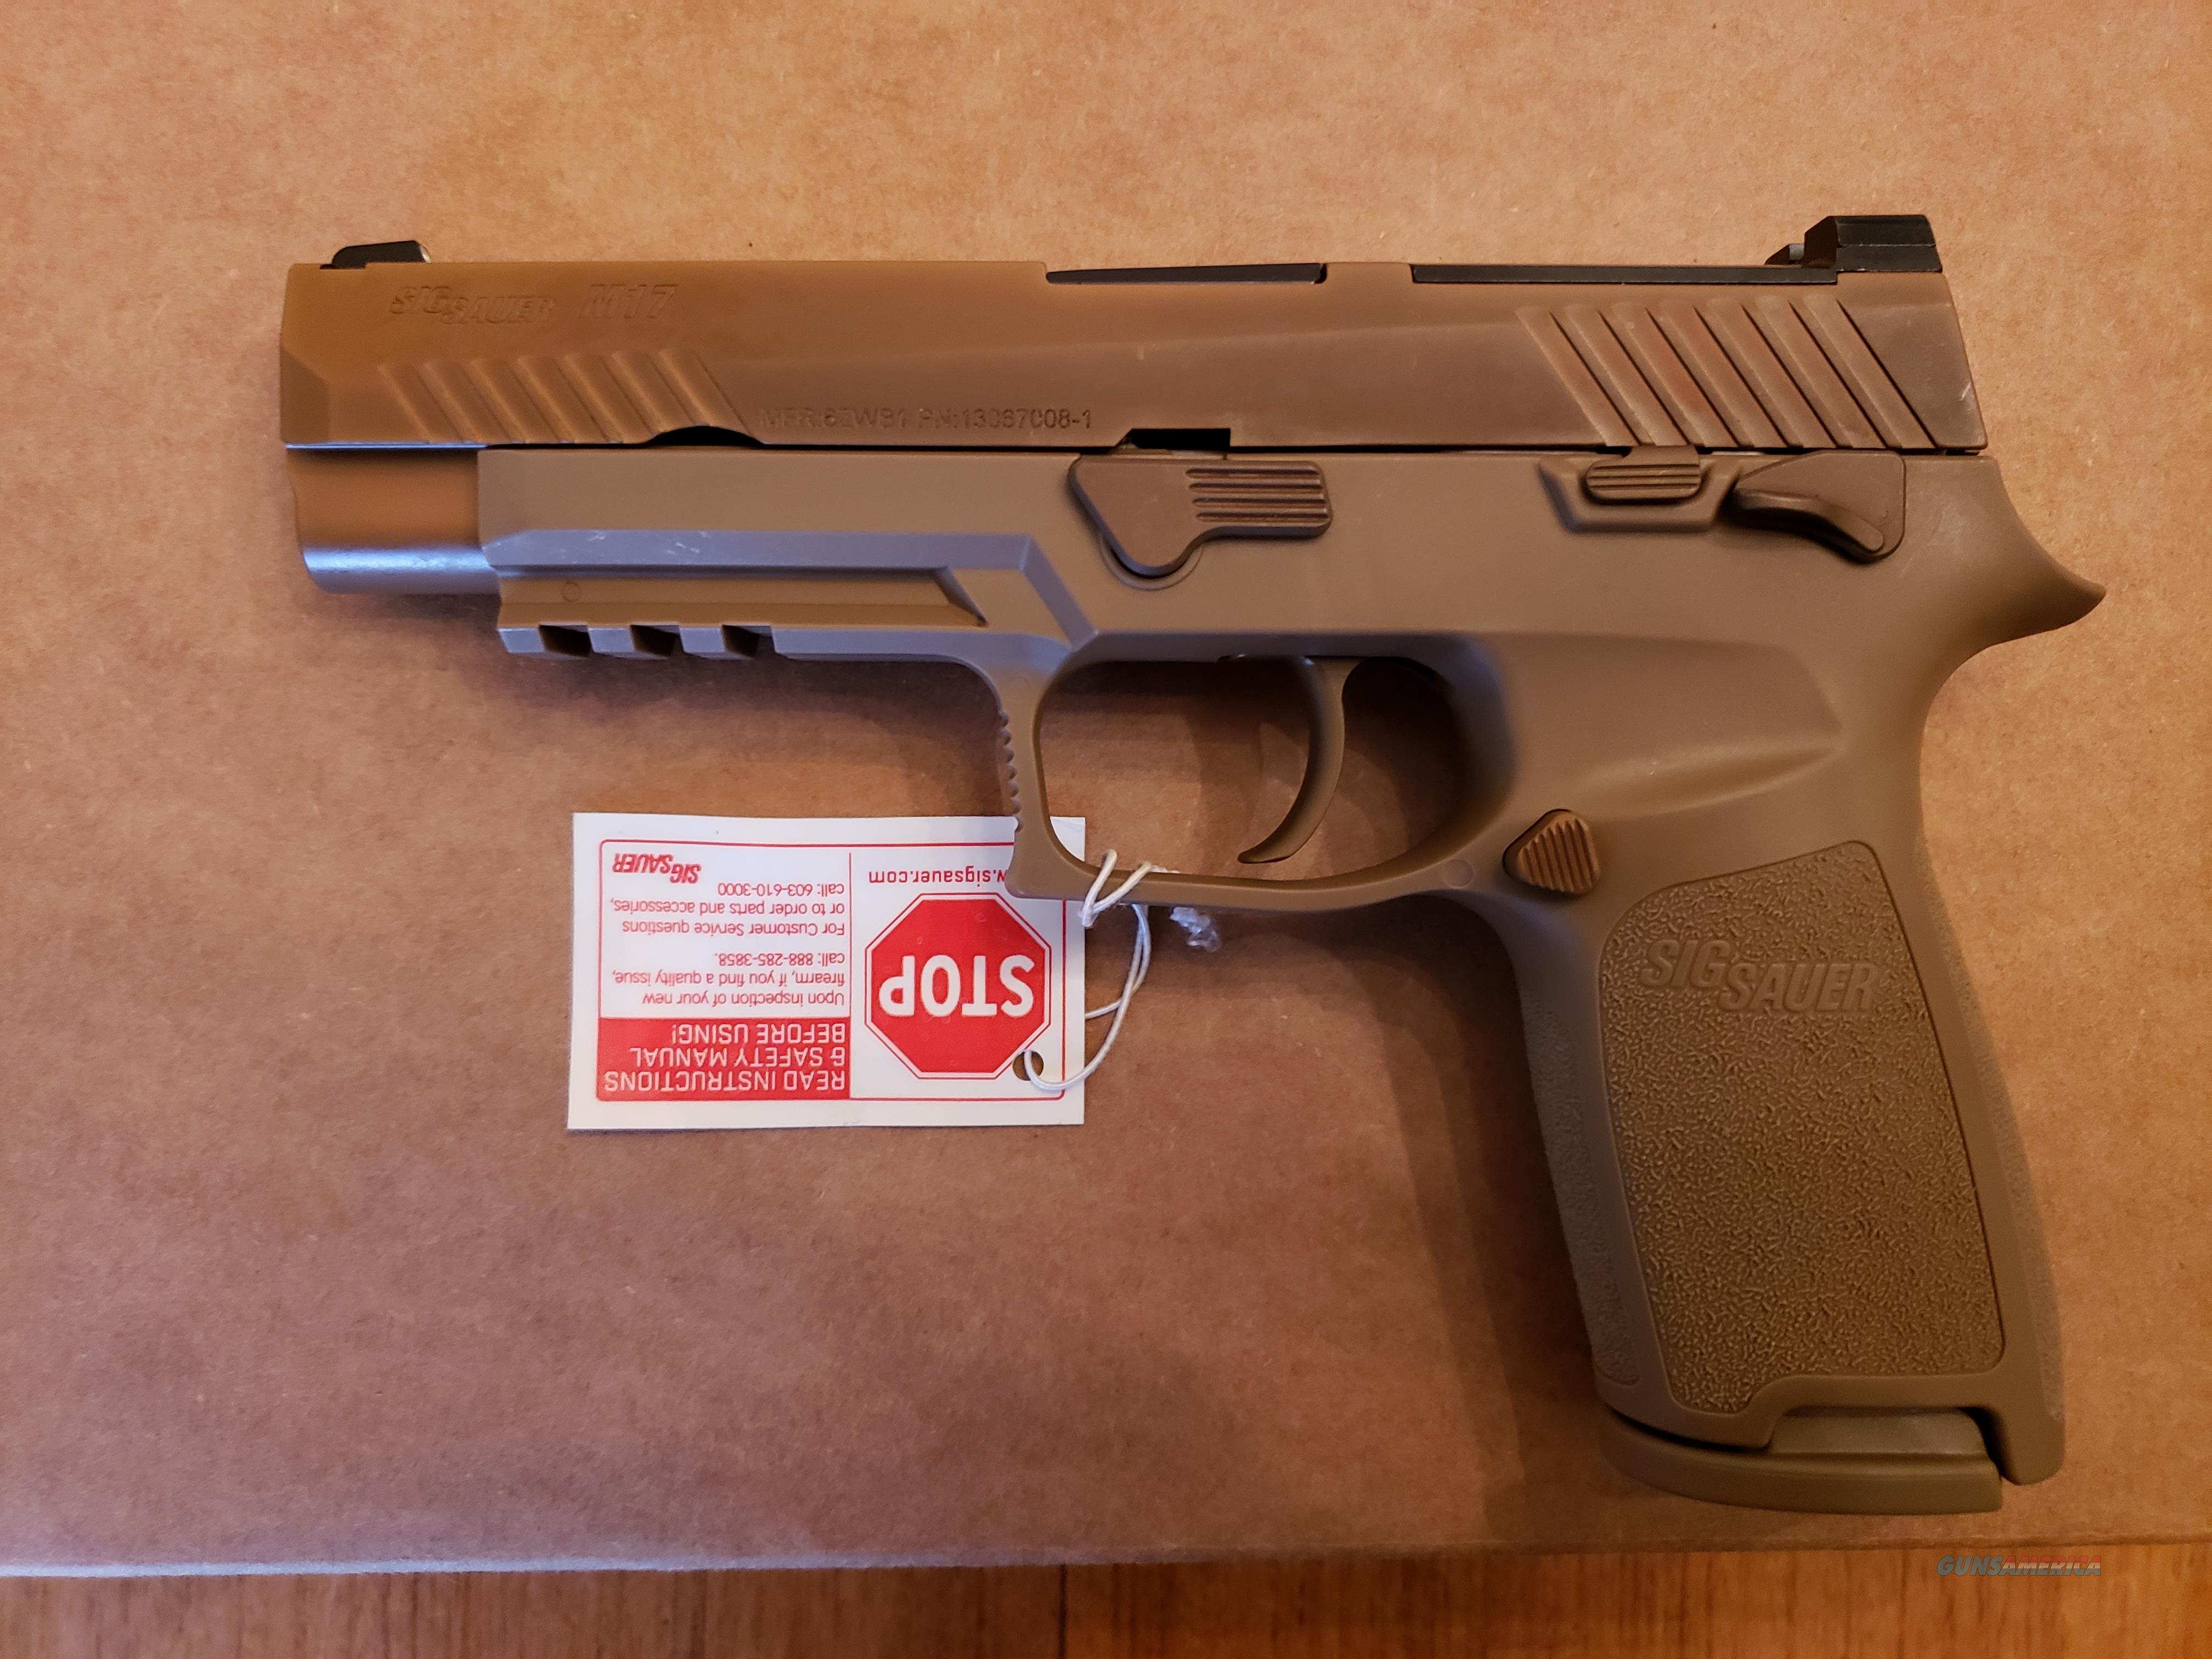 SIG Sauer M17- Commemorative Model  Guns > Pistols > Sig - Sauer/Sigarms Pistols > P320